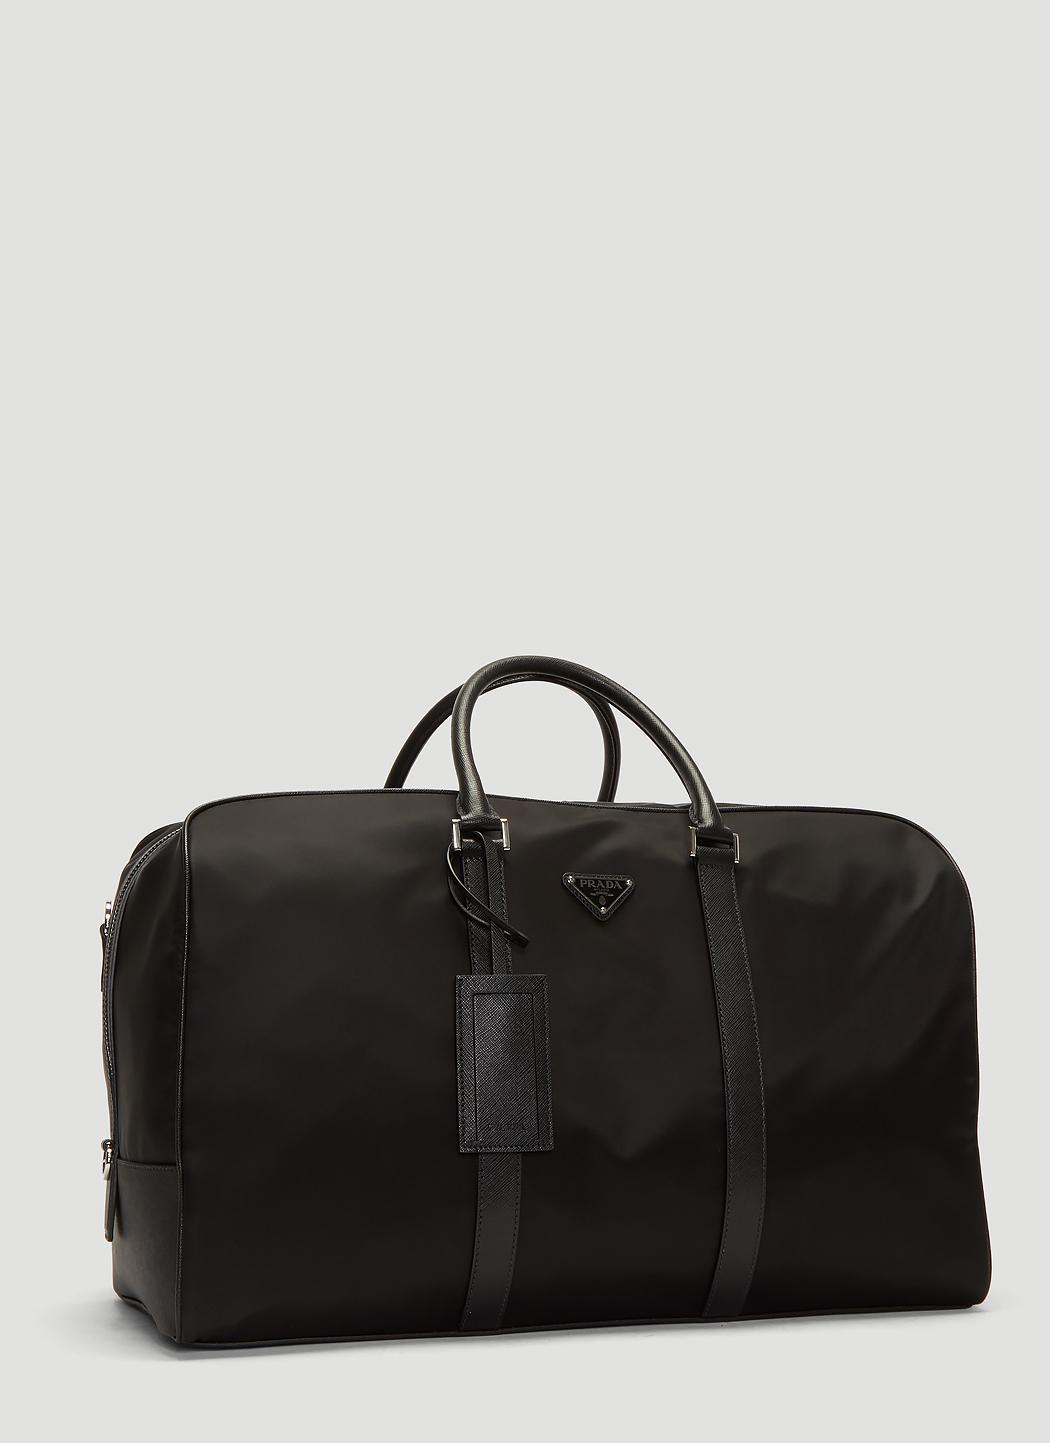 b6c9c2bd511f Prada - Black Nylon And Saffiano Leather Duffle Bag for Men - Lyst. View  fullscreen